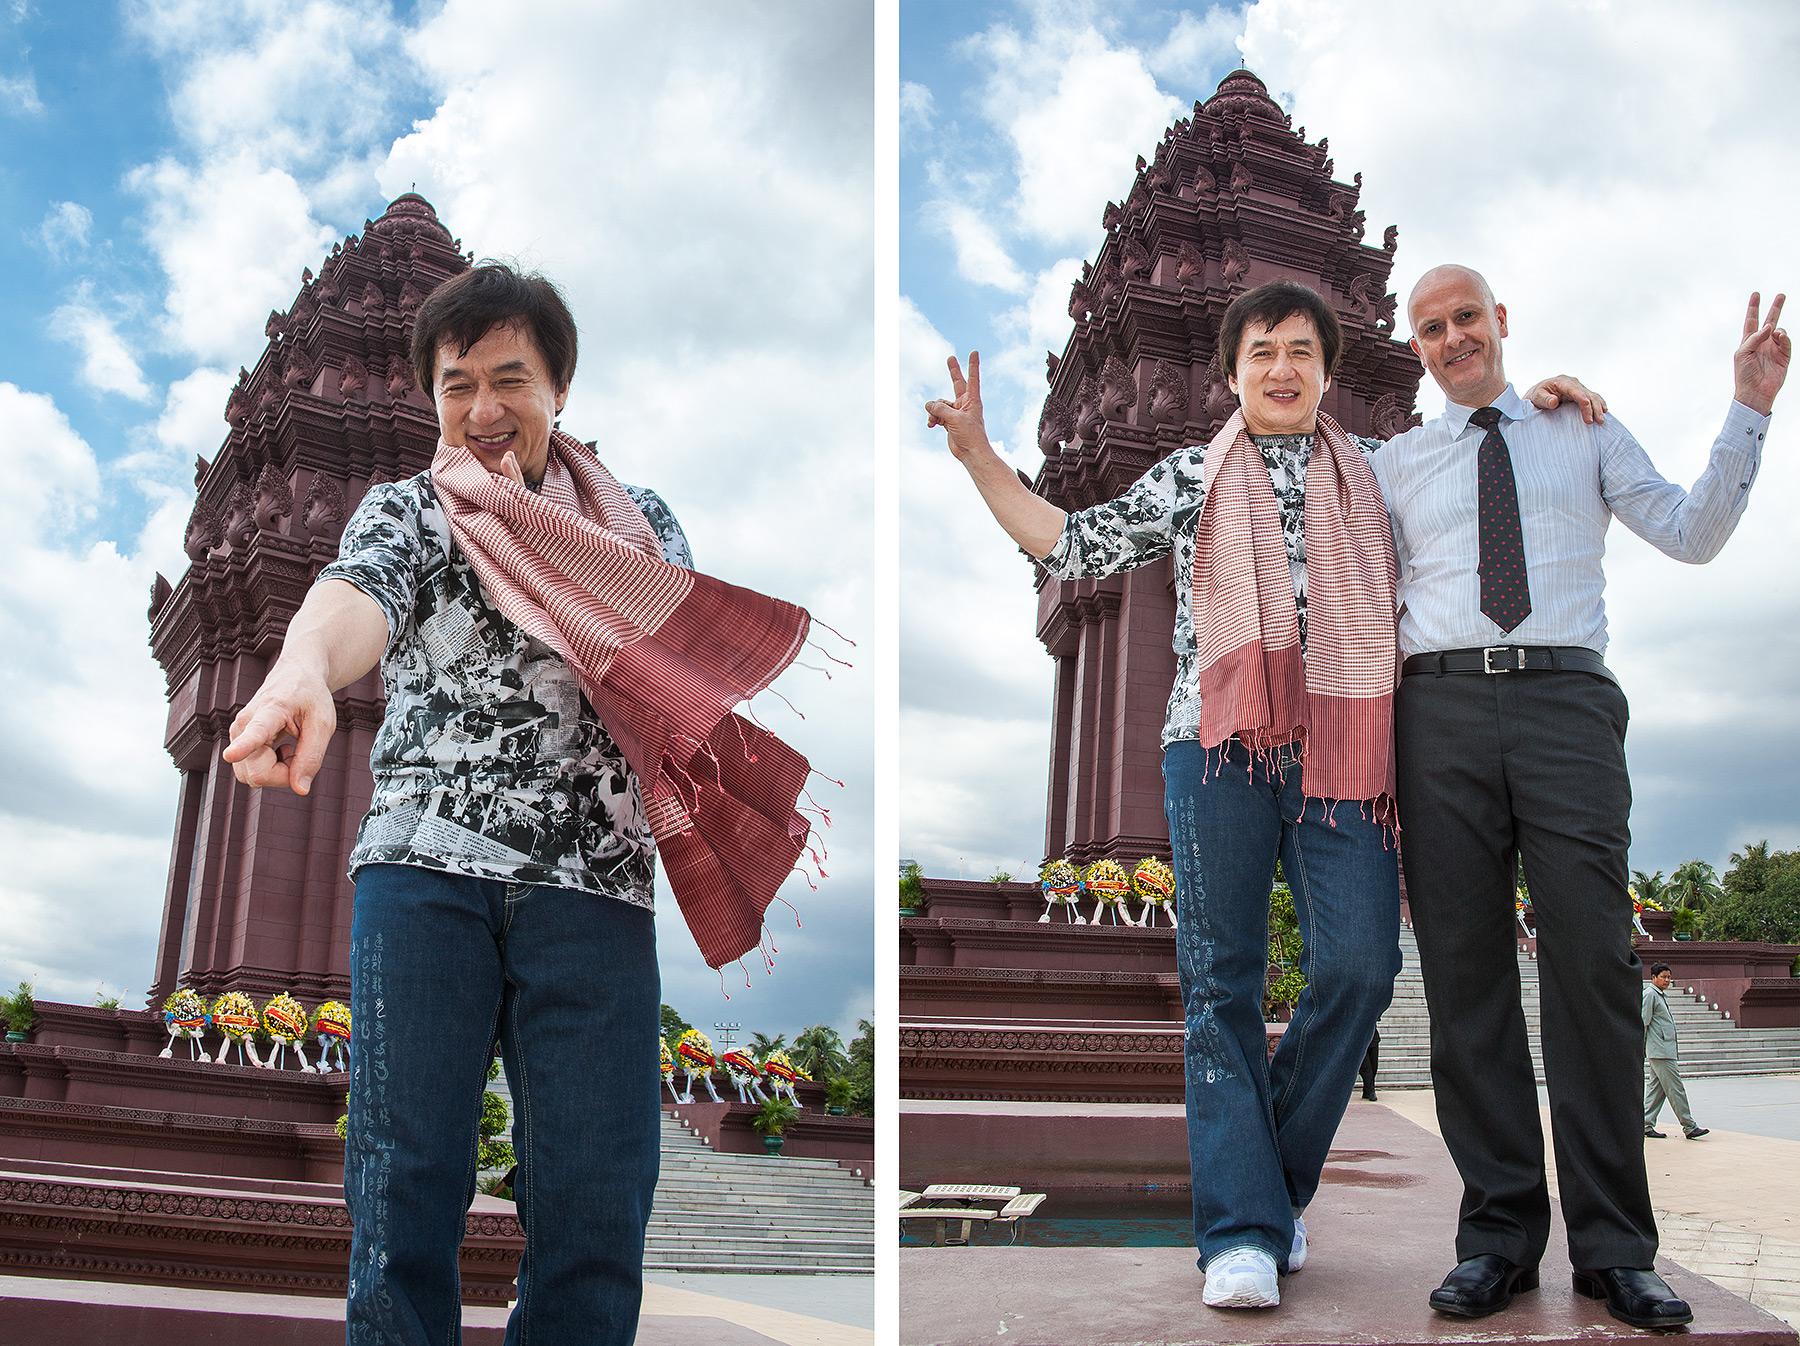 Jackie Chan and Uwe Morawetz at Ind. Monument Phnom Penh, Bridges Int. peace Foundation